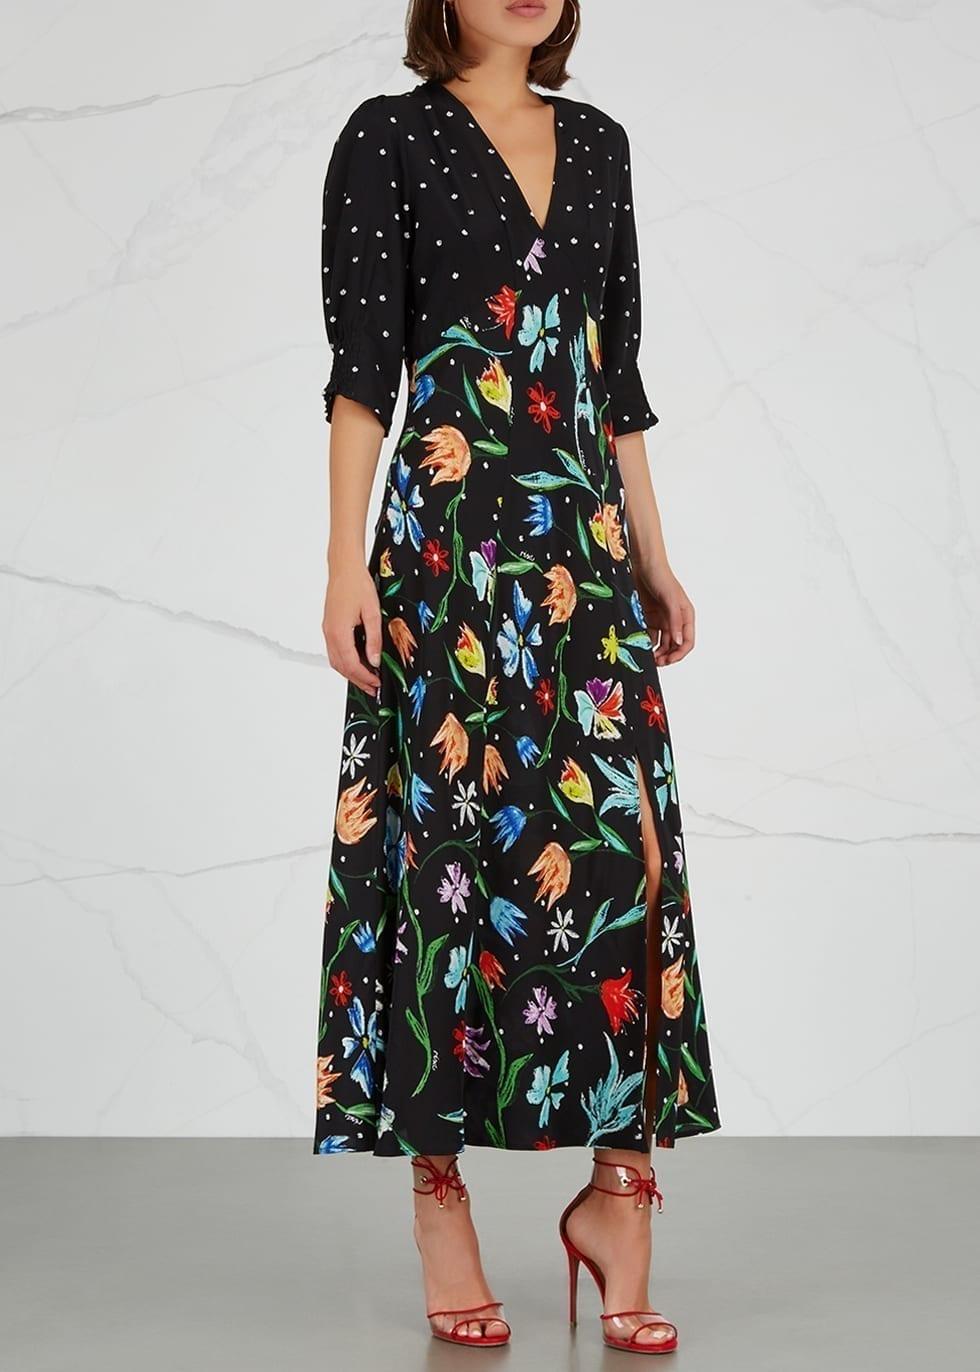 8c3b33cc102 RIXO LONDON Martha Silk Midi Black   Floral Printed Dress - We ...